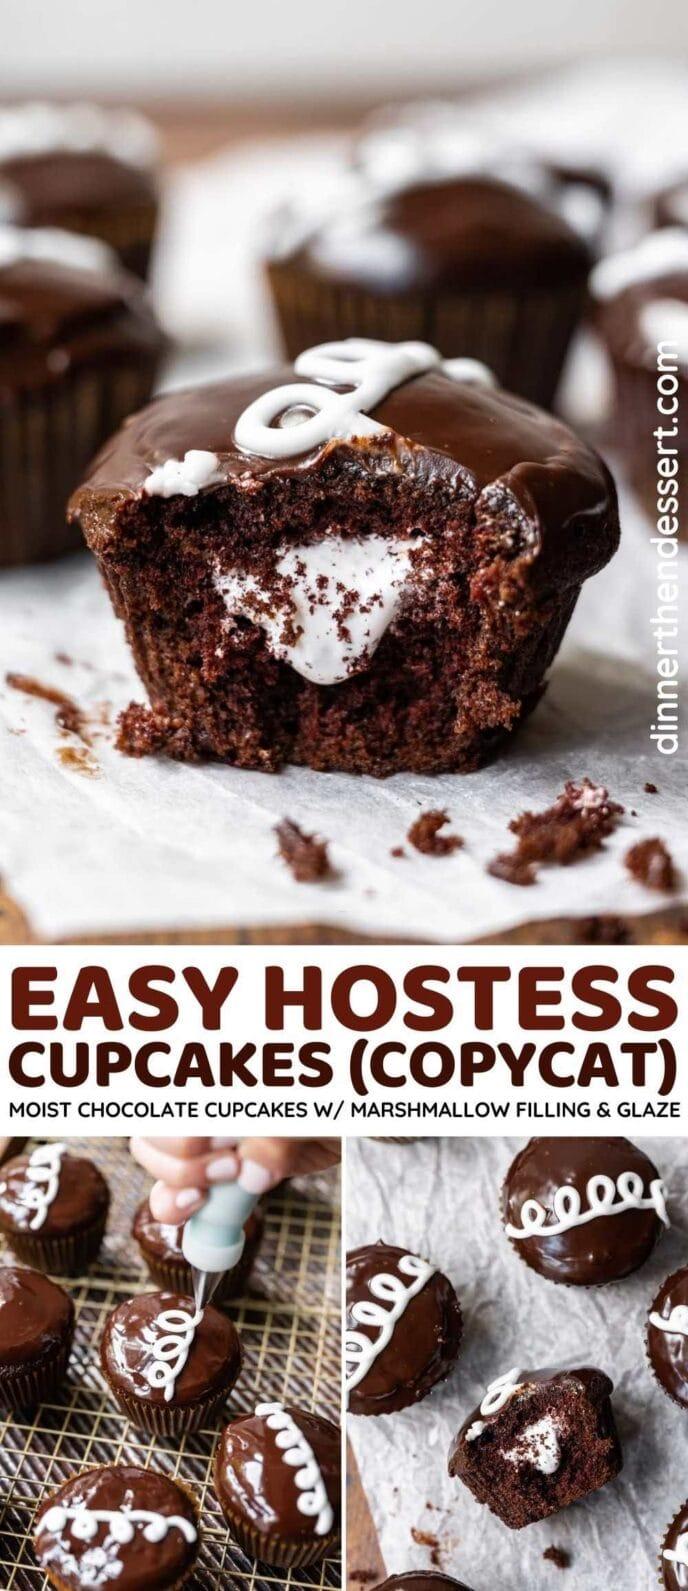 Hostess Cupcakes (Copycat) collage